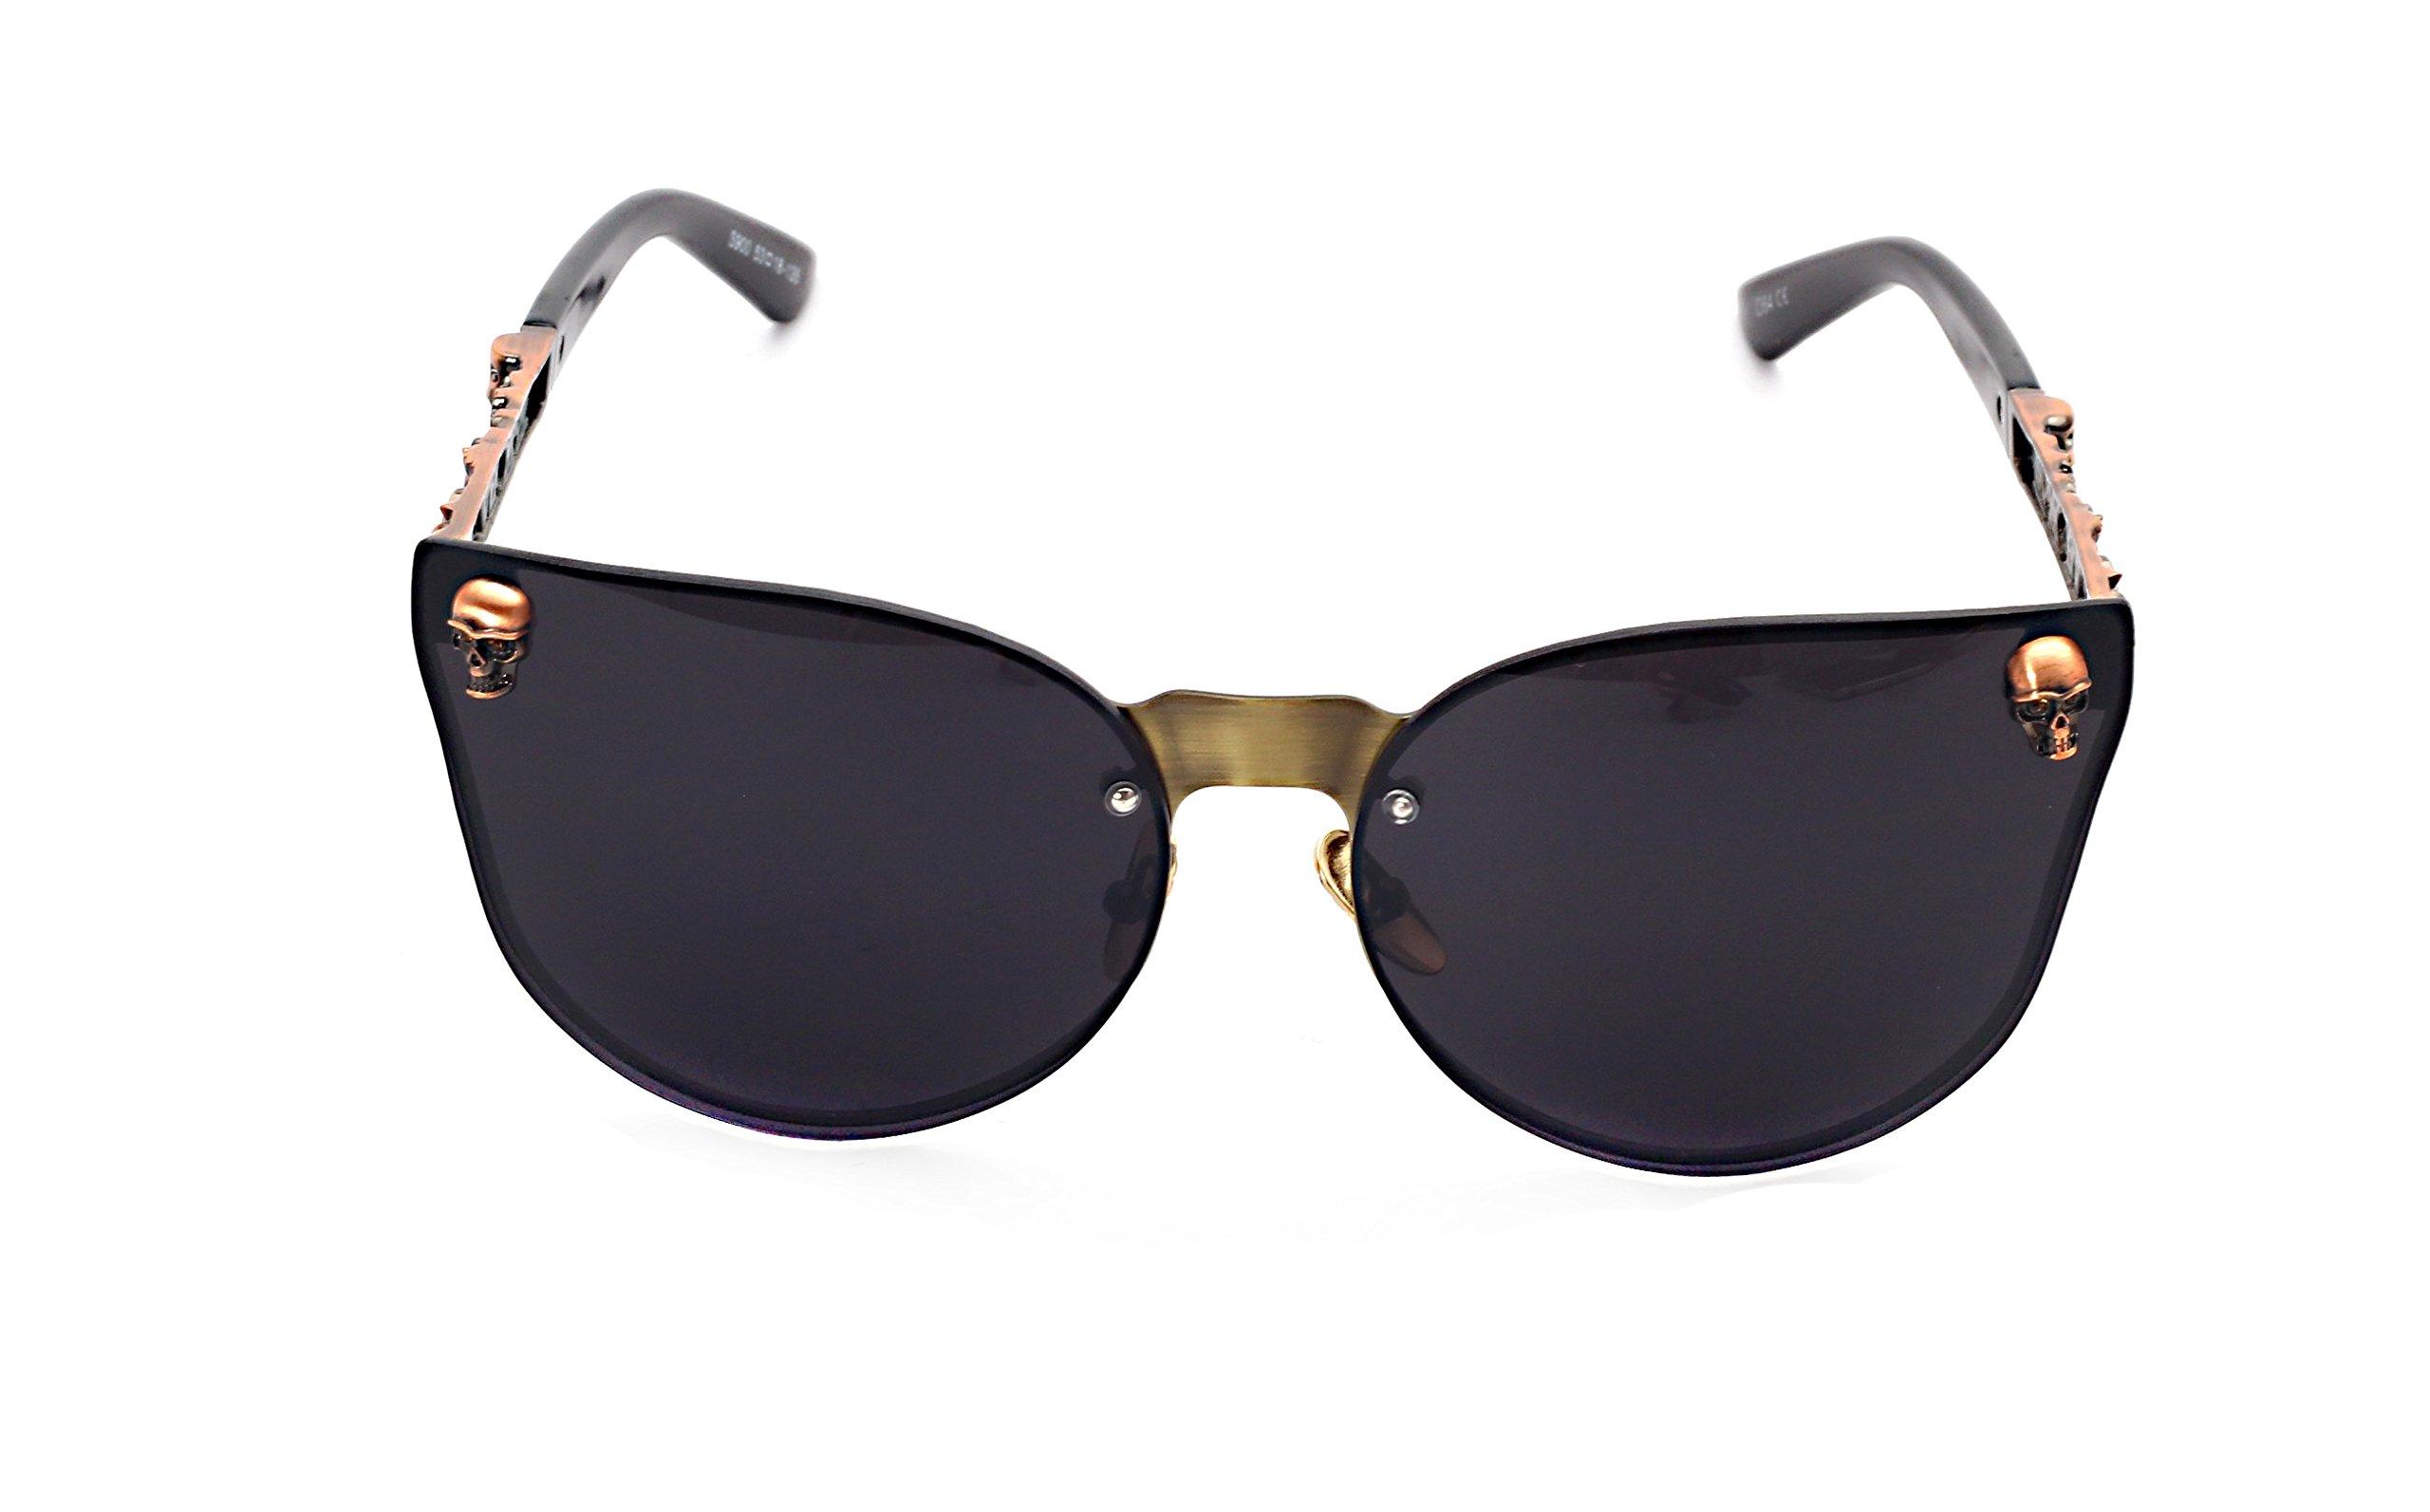 Women's Metal Half Frame Semi-Rimless Cateye Skull Studded Sunglasses - UV400 by Pession (Image #2)